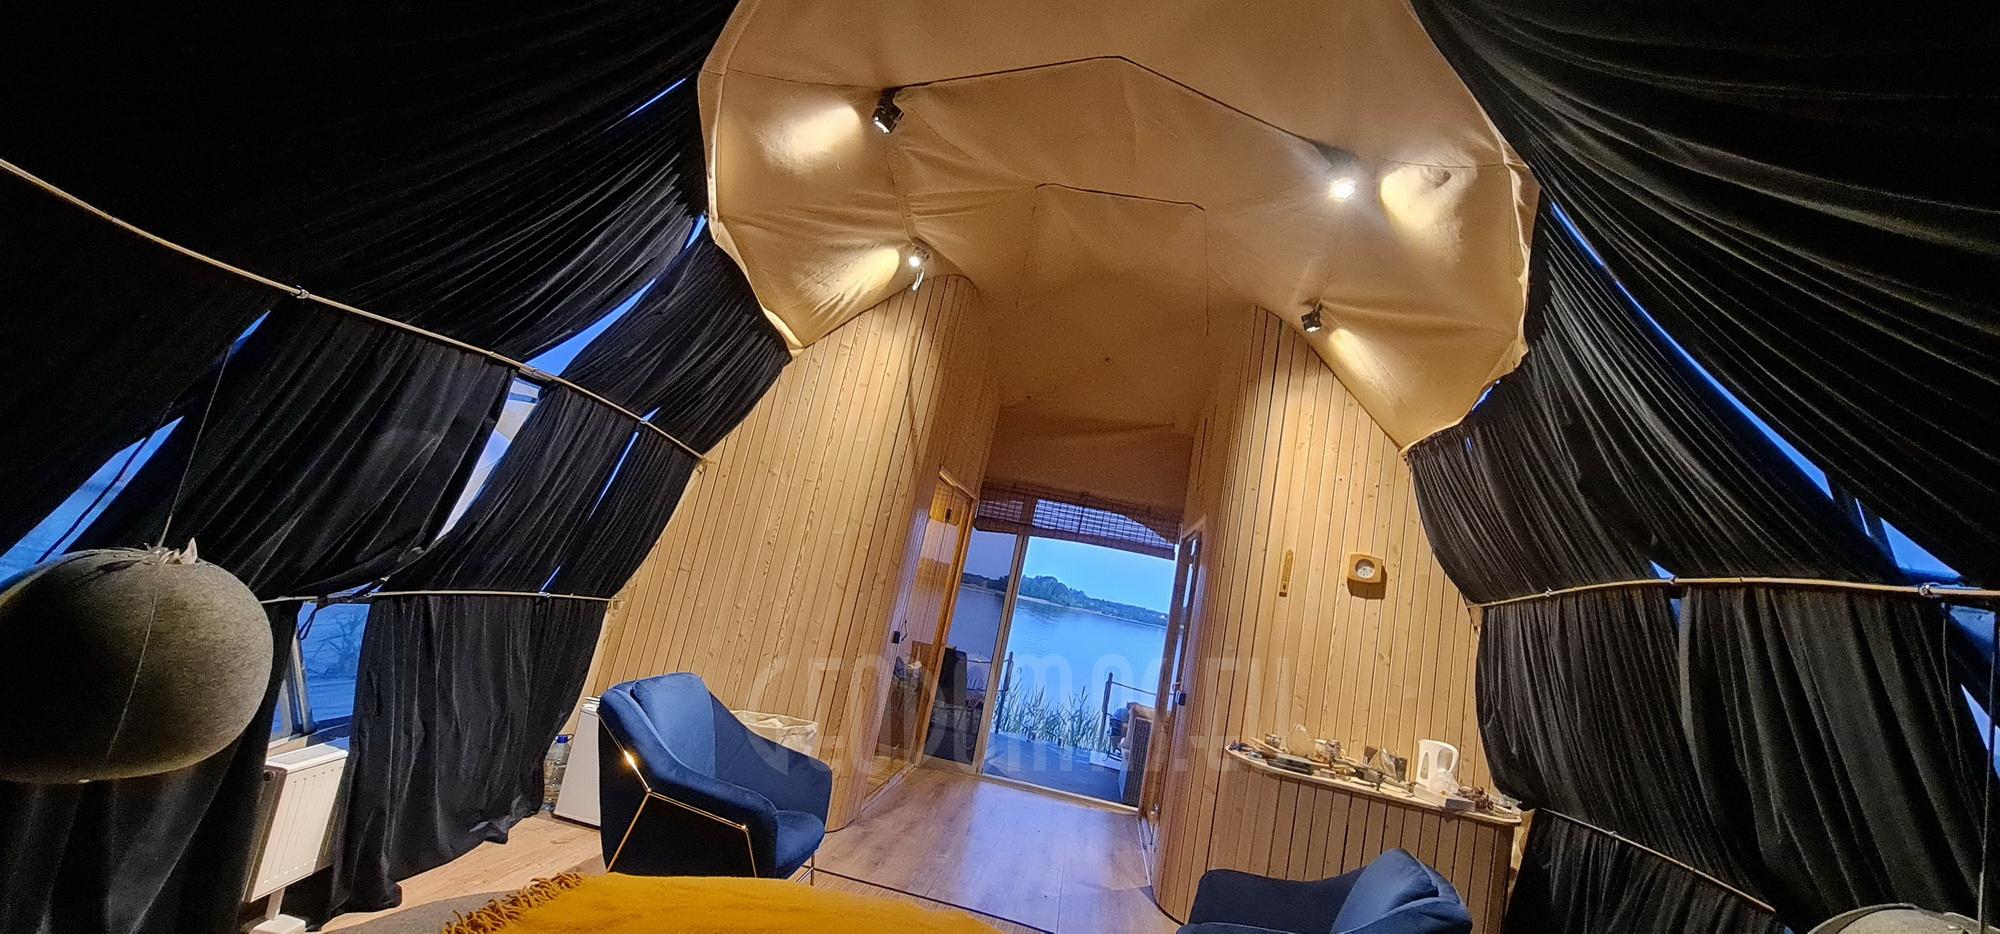 27m² Ø7m Плавающий купол, Роскошная яхта для глэмпинга   Тракай, Литва